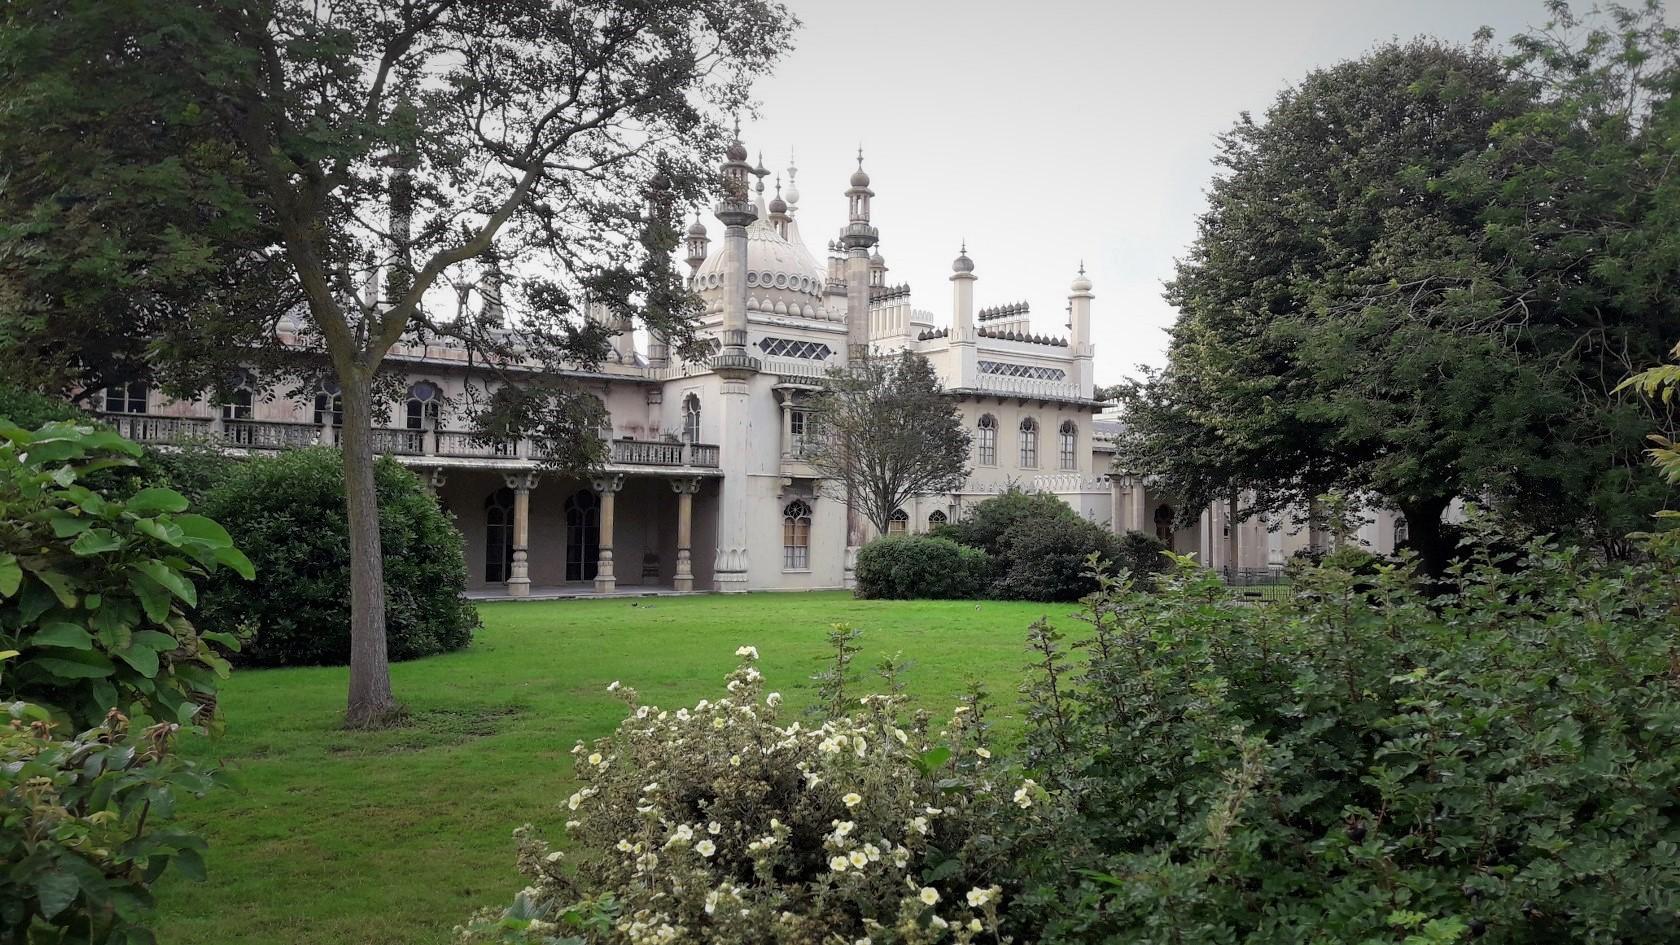 Royal Pavilion (Брайтон) – вид из сада